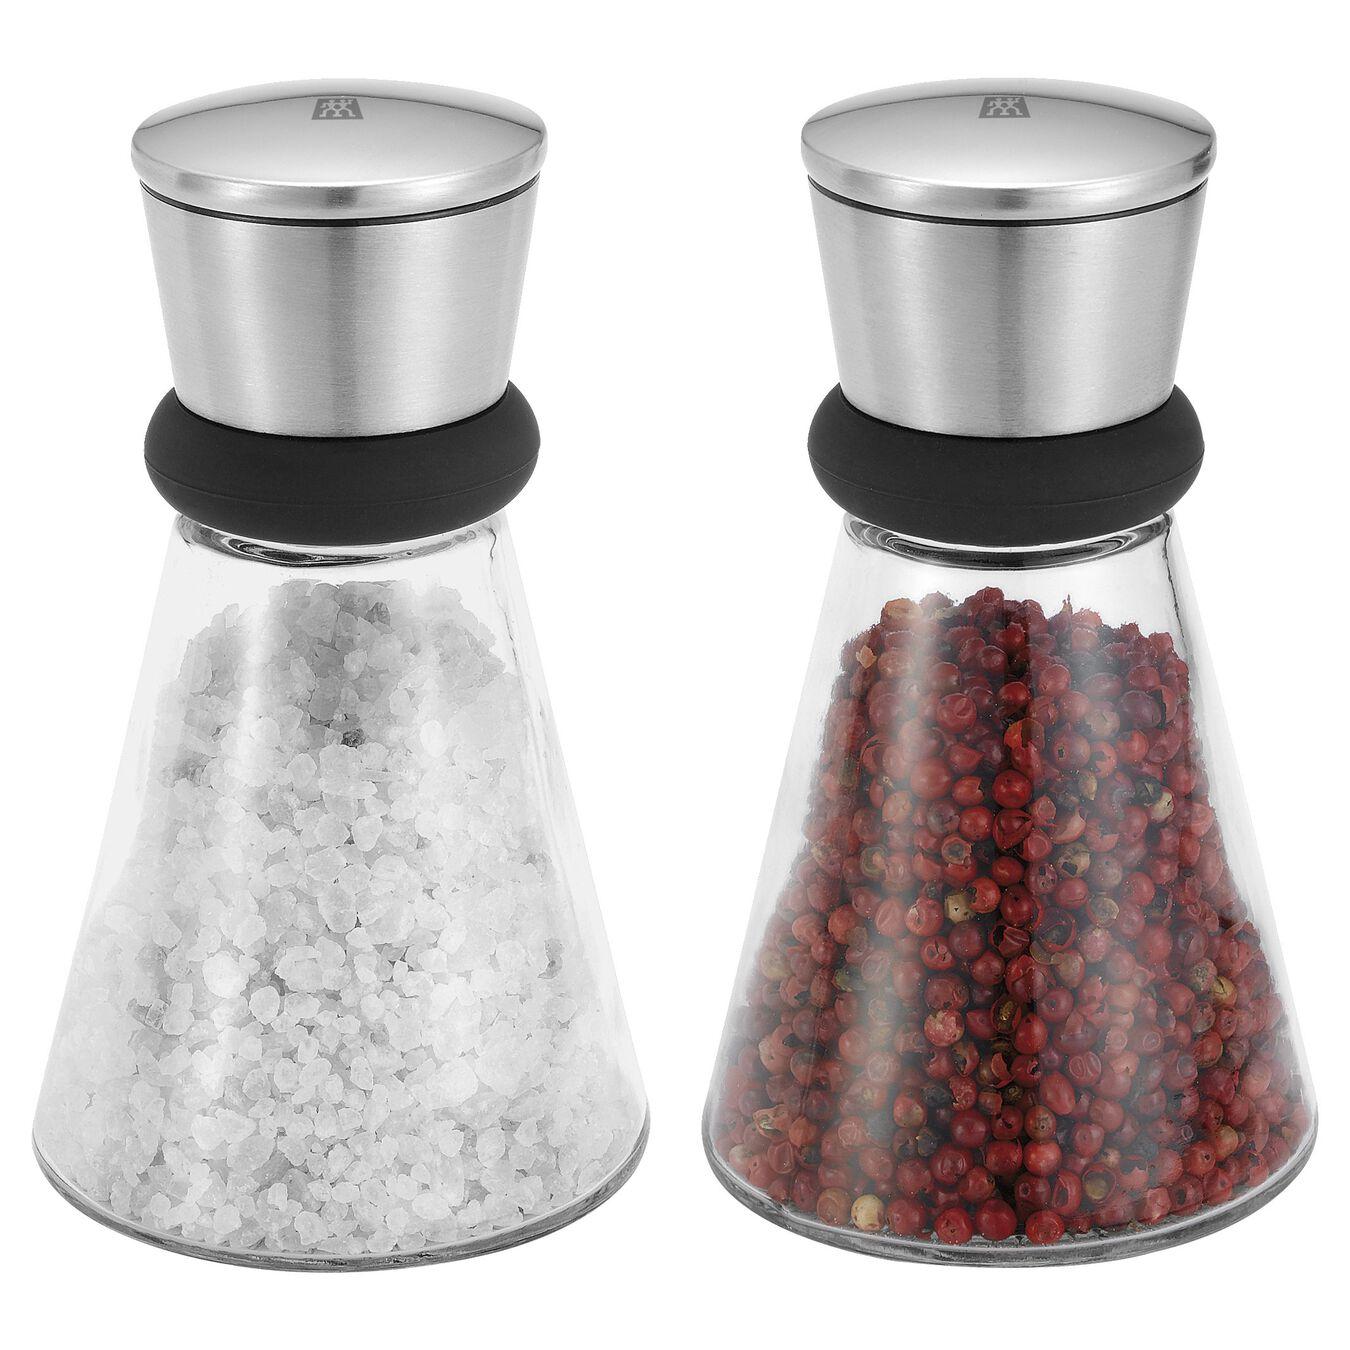 2 Piece 2 Piece Salt/pepper mill,,large 1